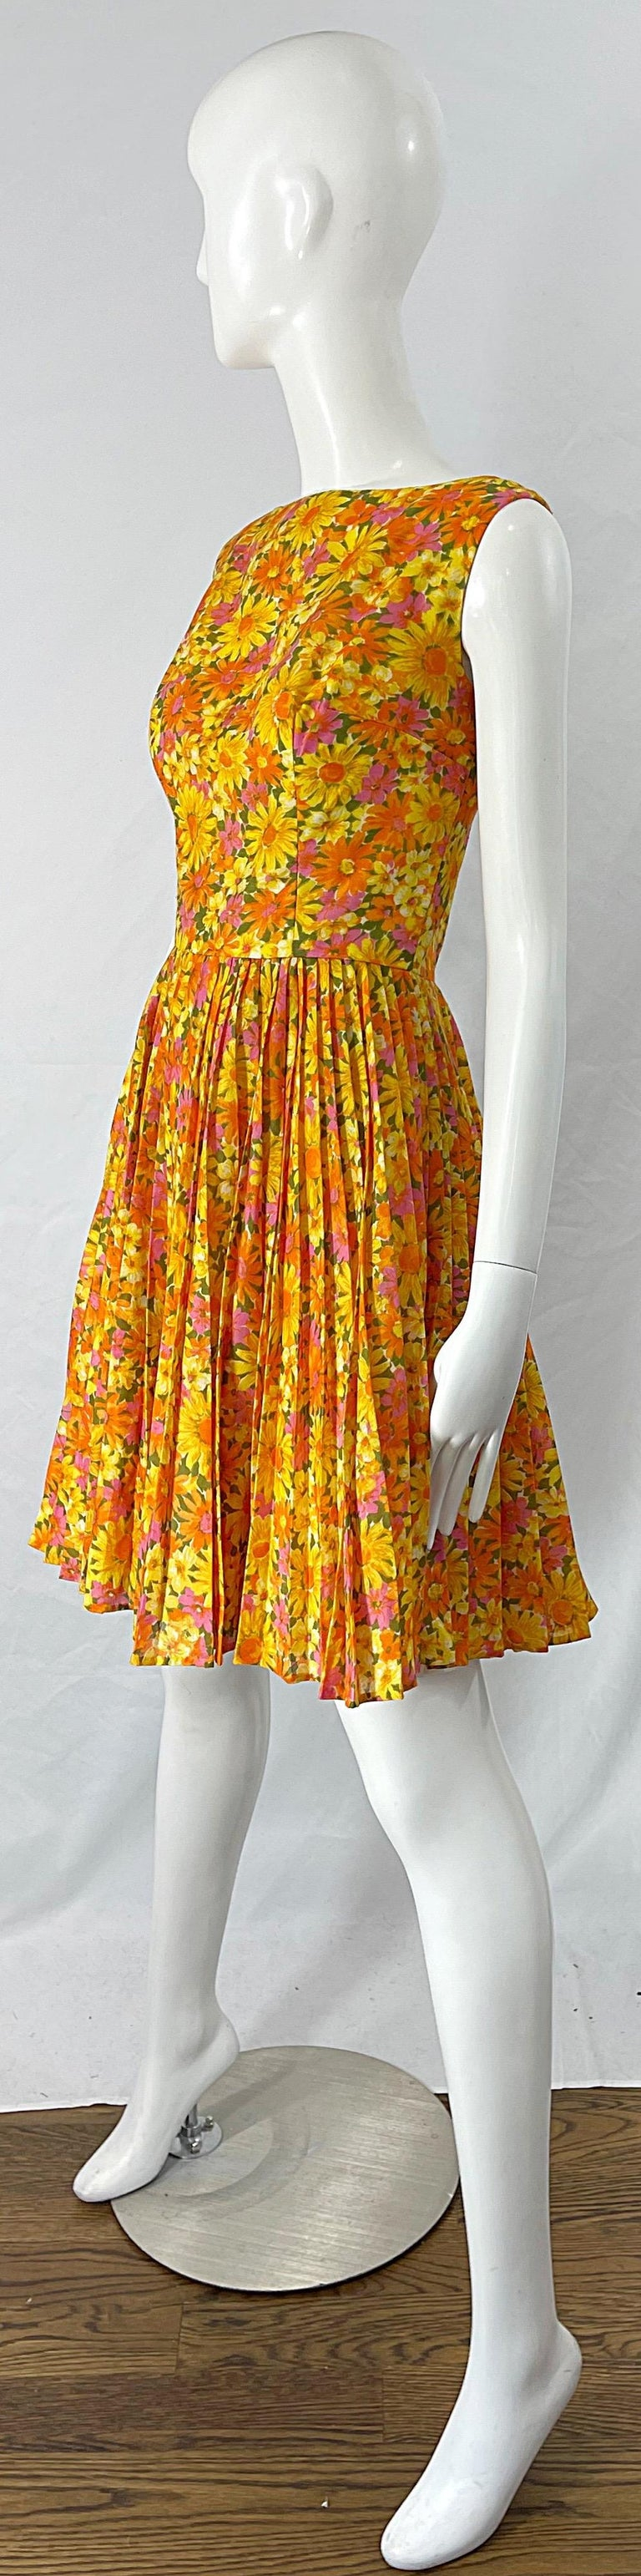 1950s Suzy Perette Yellow Pink Orange Daisy Print Cotton Vintage 50s Dress For Sale 8